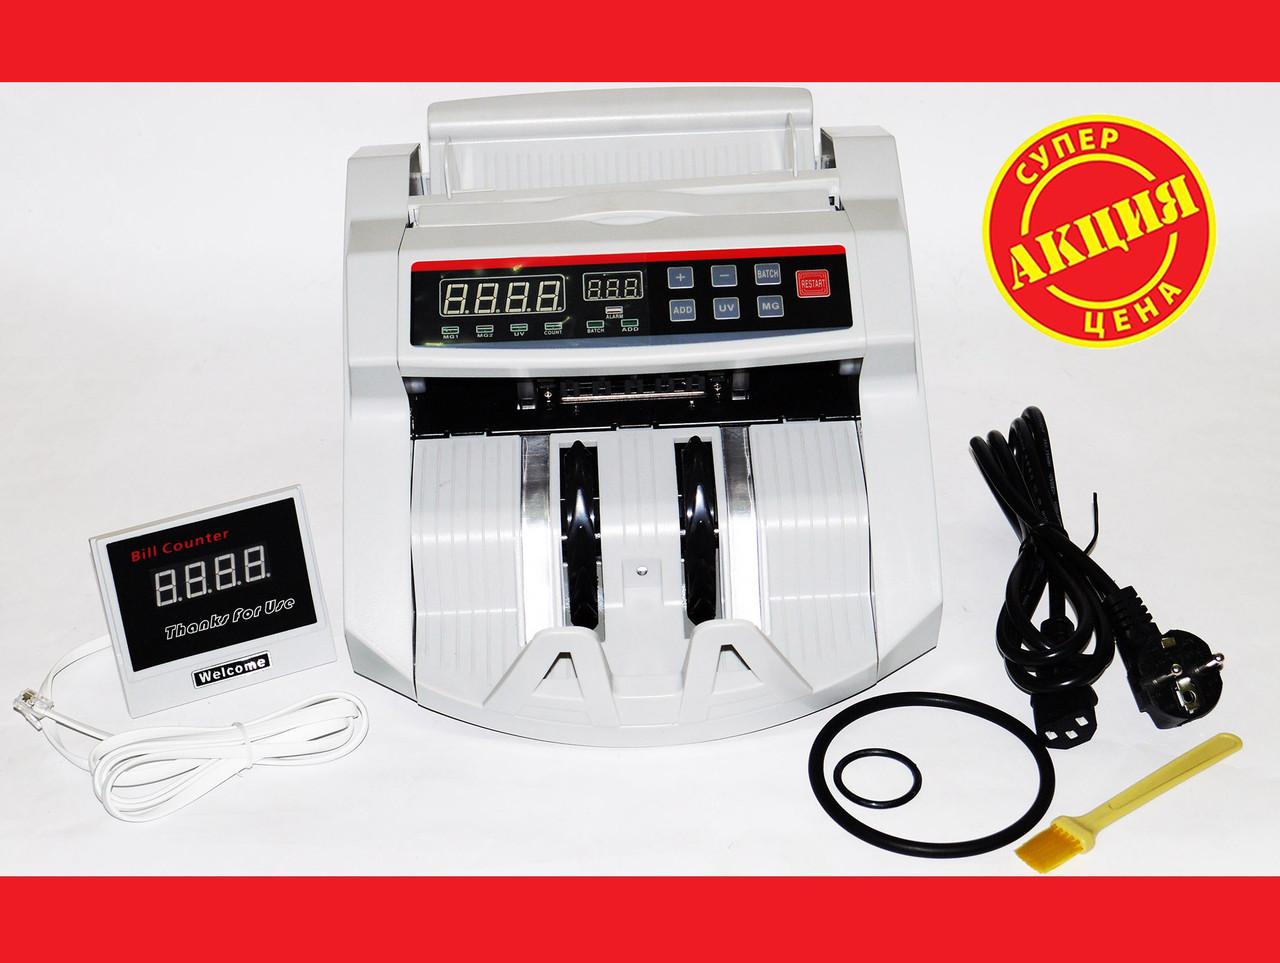 Bill Counter 2089/7089 Счетная машинка для купюр